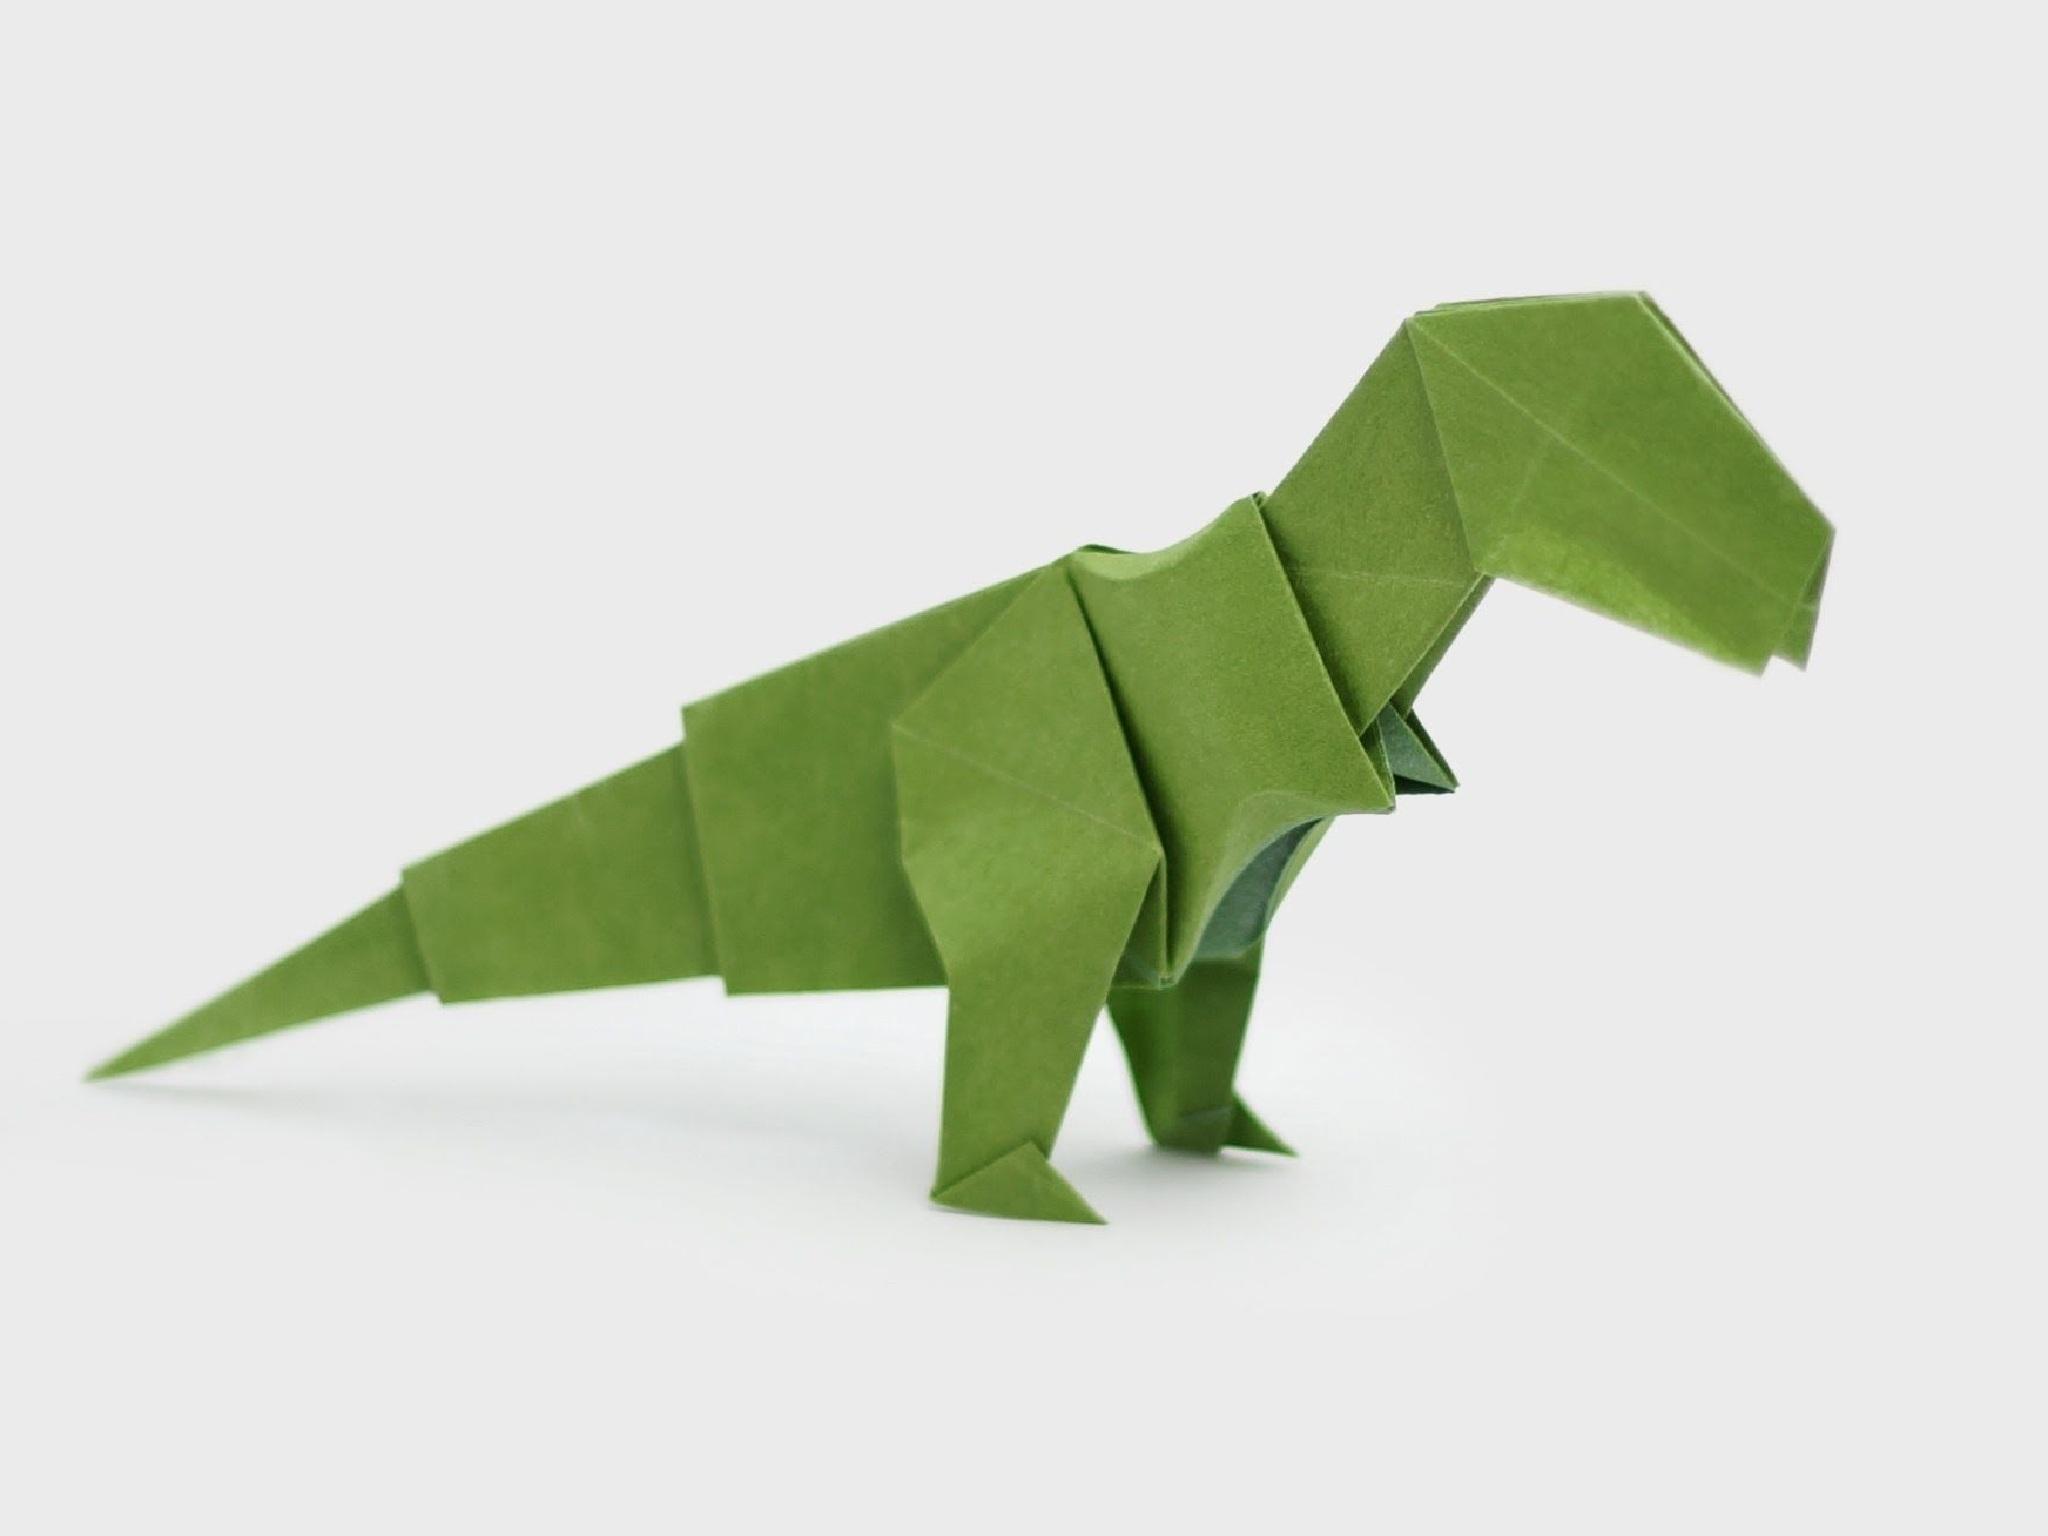 Hobby,  Dobrar Papel, Origami, Dinossauro Verde